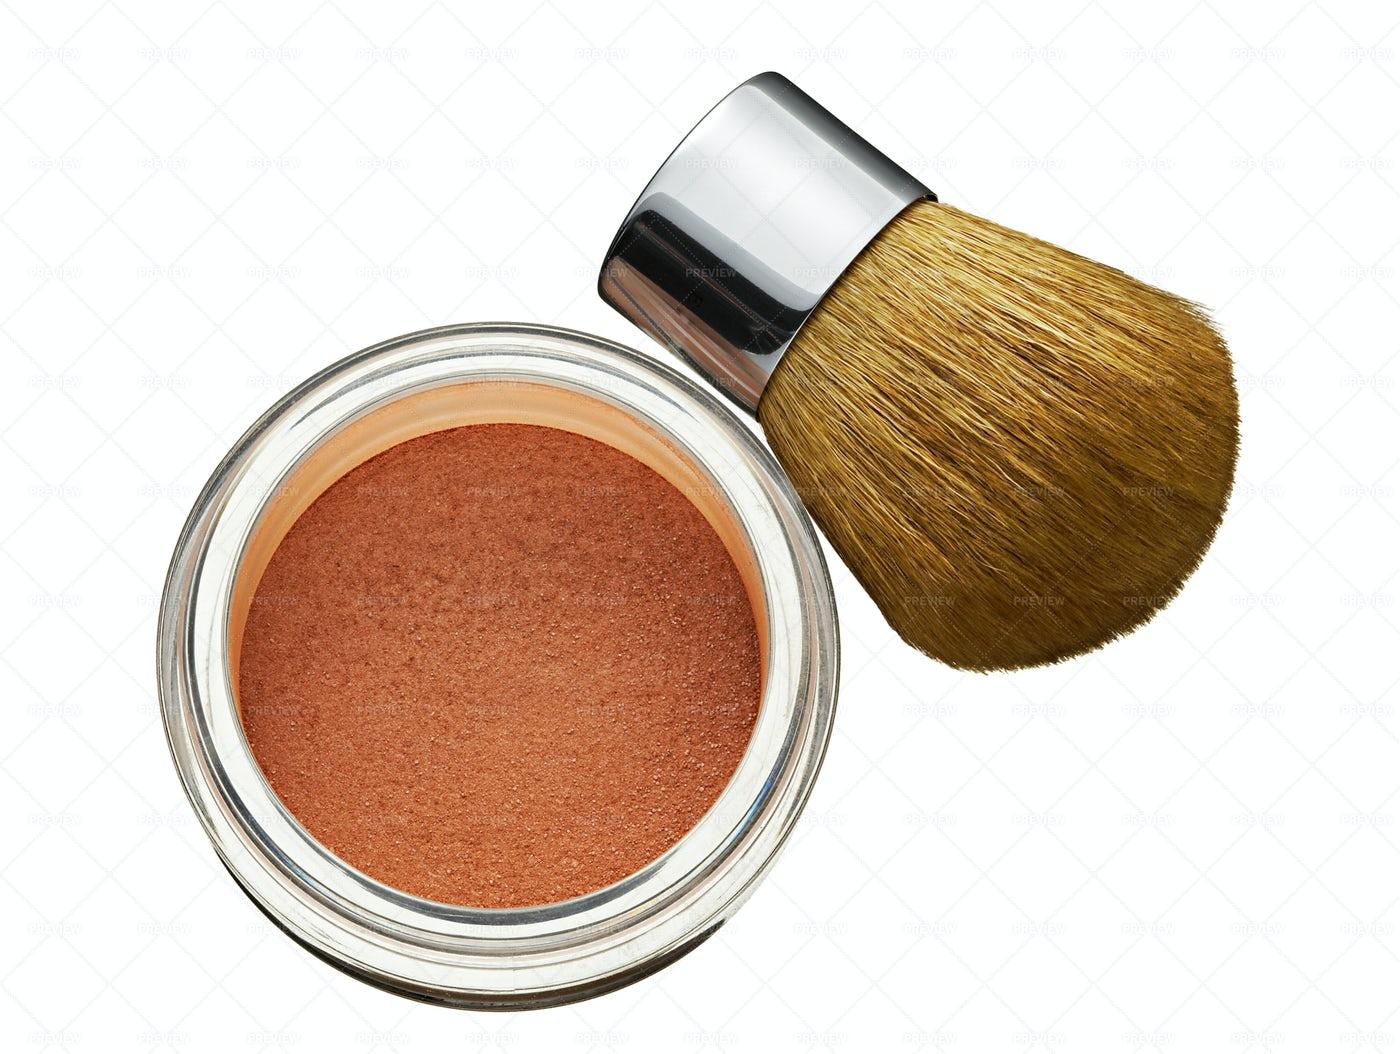 Cosmetics Foundation Powder: Stock Photos